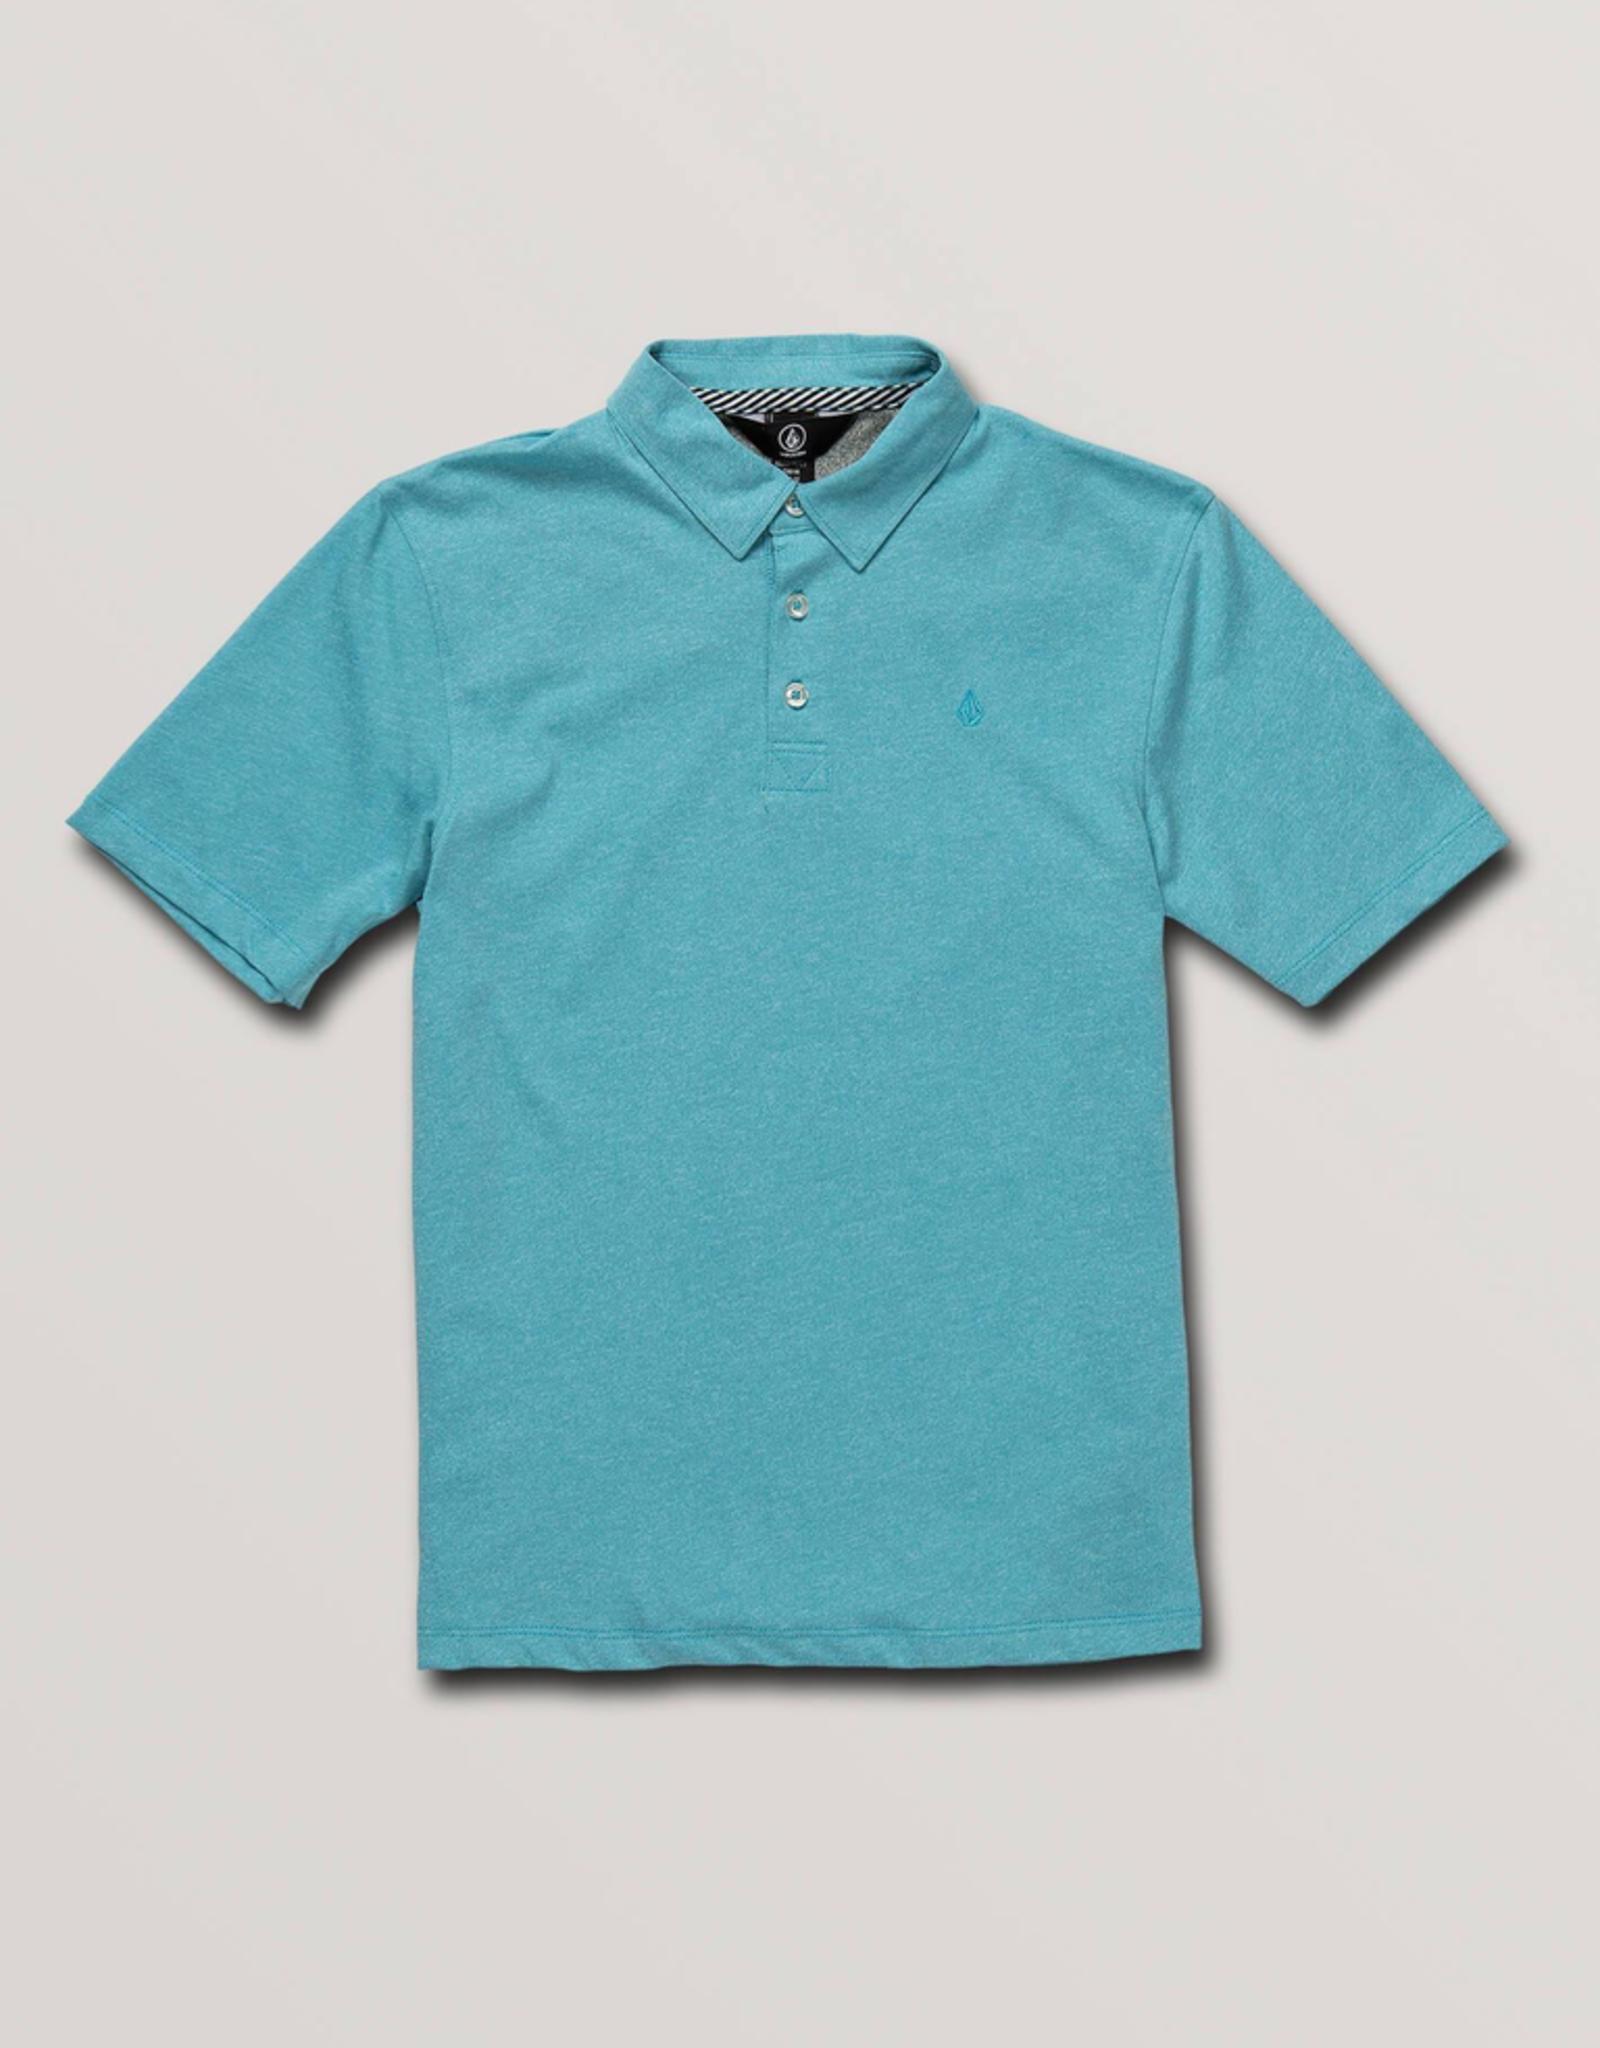 Wowzer Polo Short Sleeve Shirt for Boy